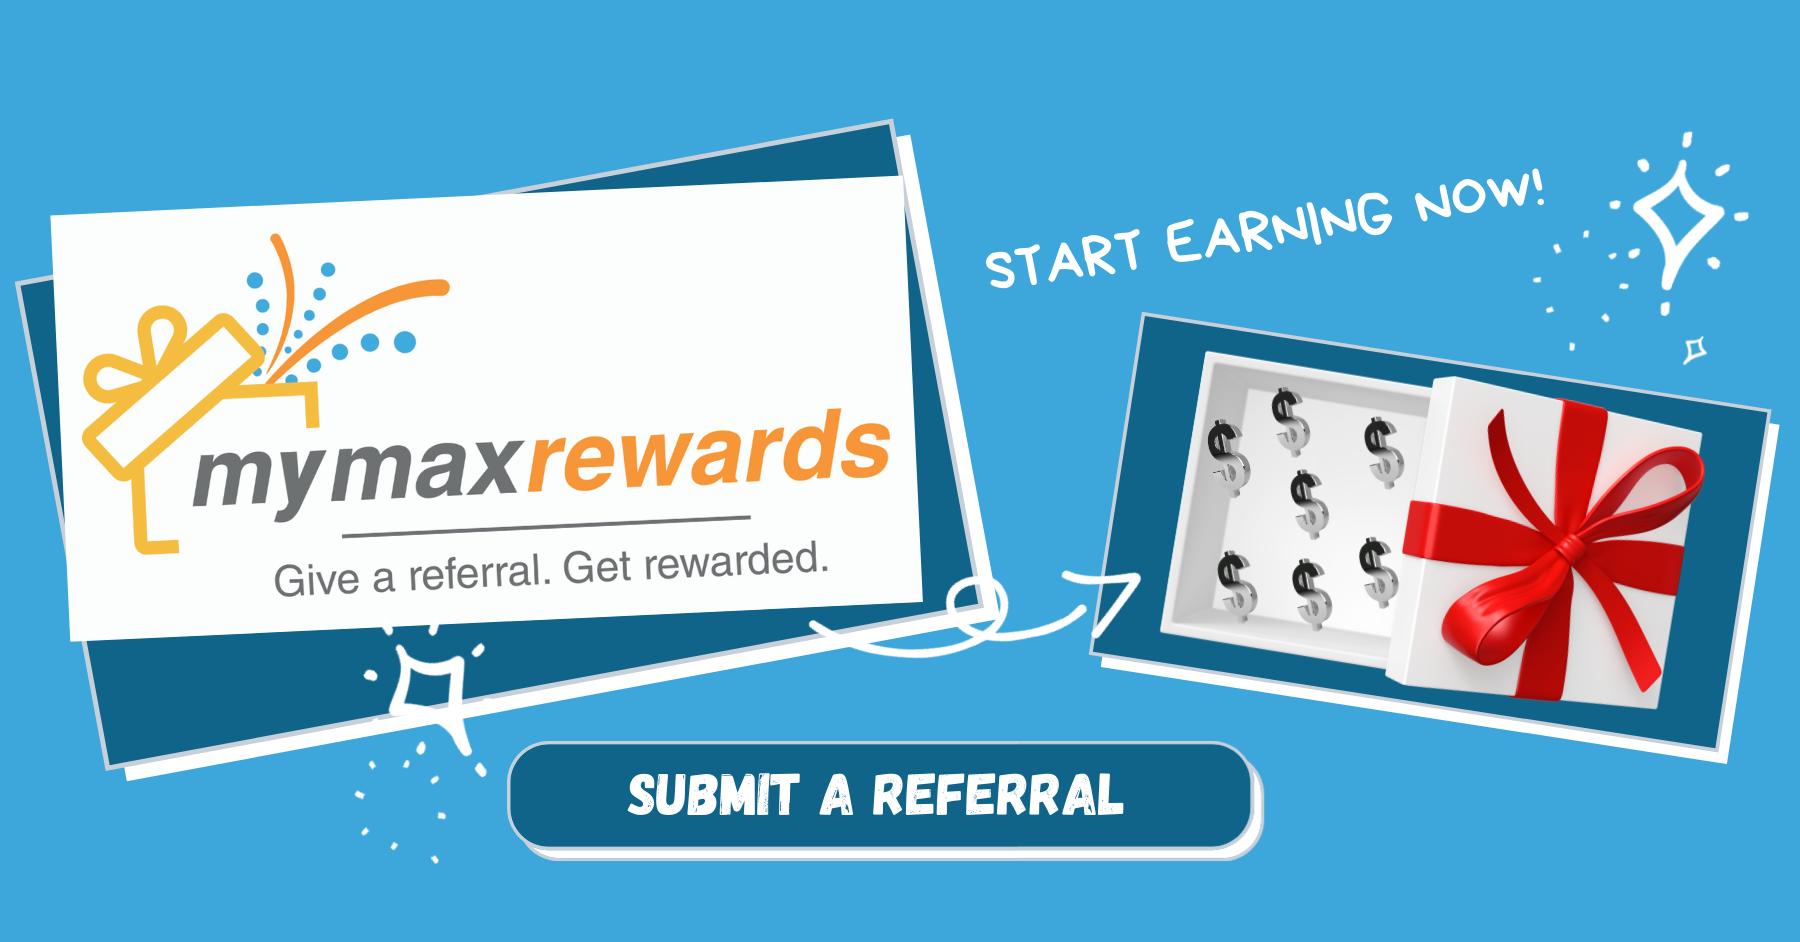 MyMaxRewards Referral Program